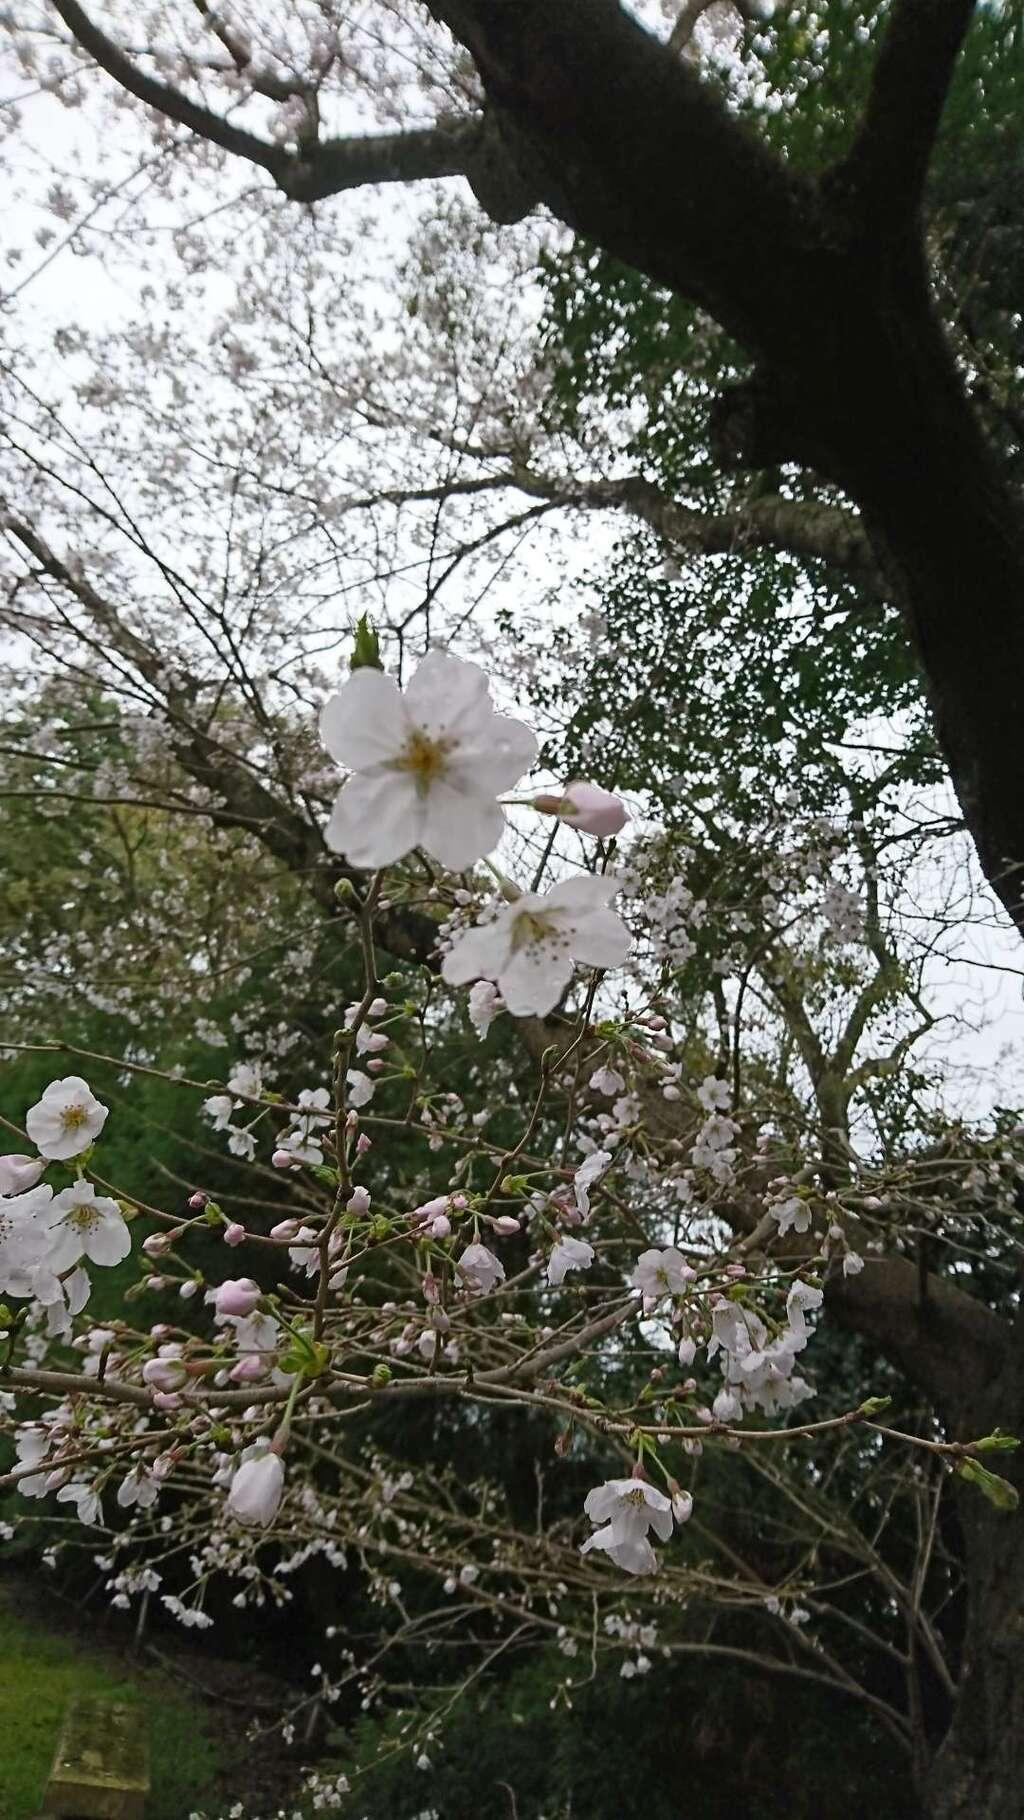 河内阿蘇神社の自然